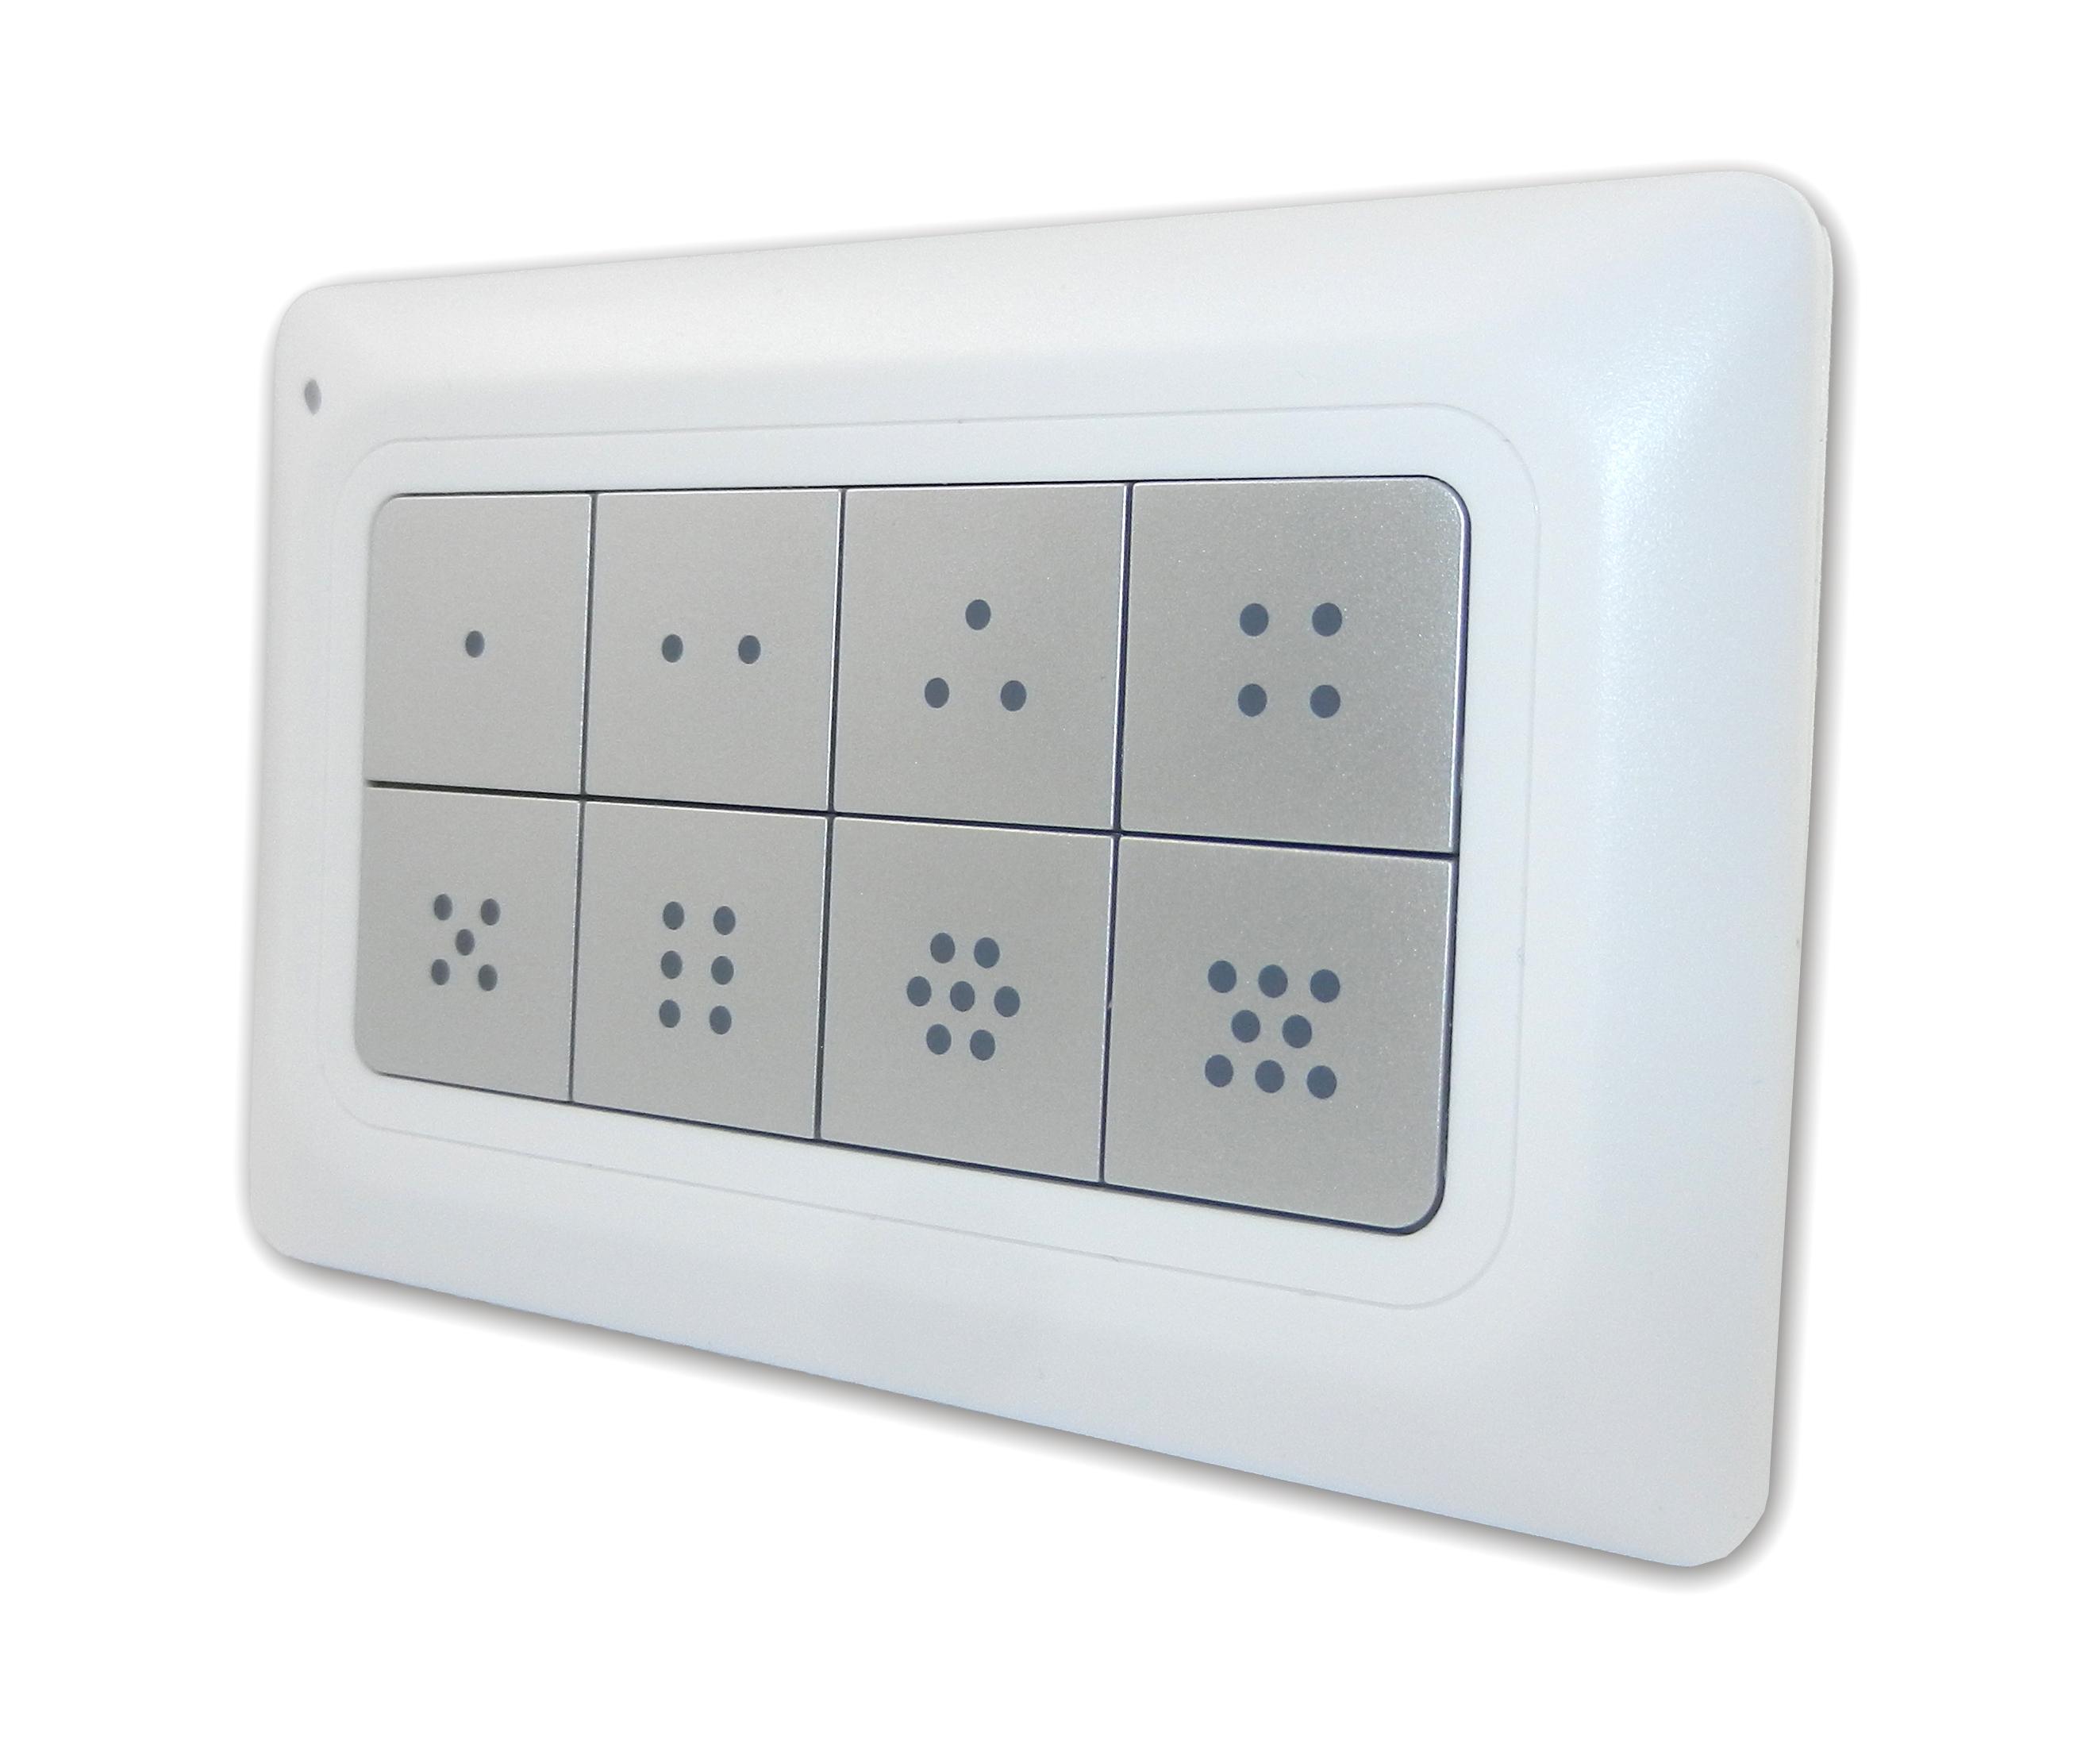 remotec scene master remote controls z wave controller products z wave europe store. Black Bedroom Furniture Sets. Home Design Ideas